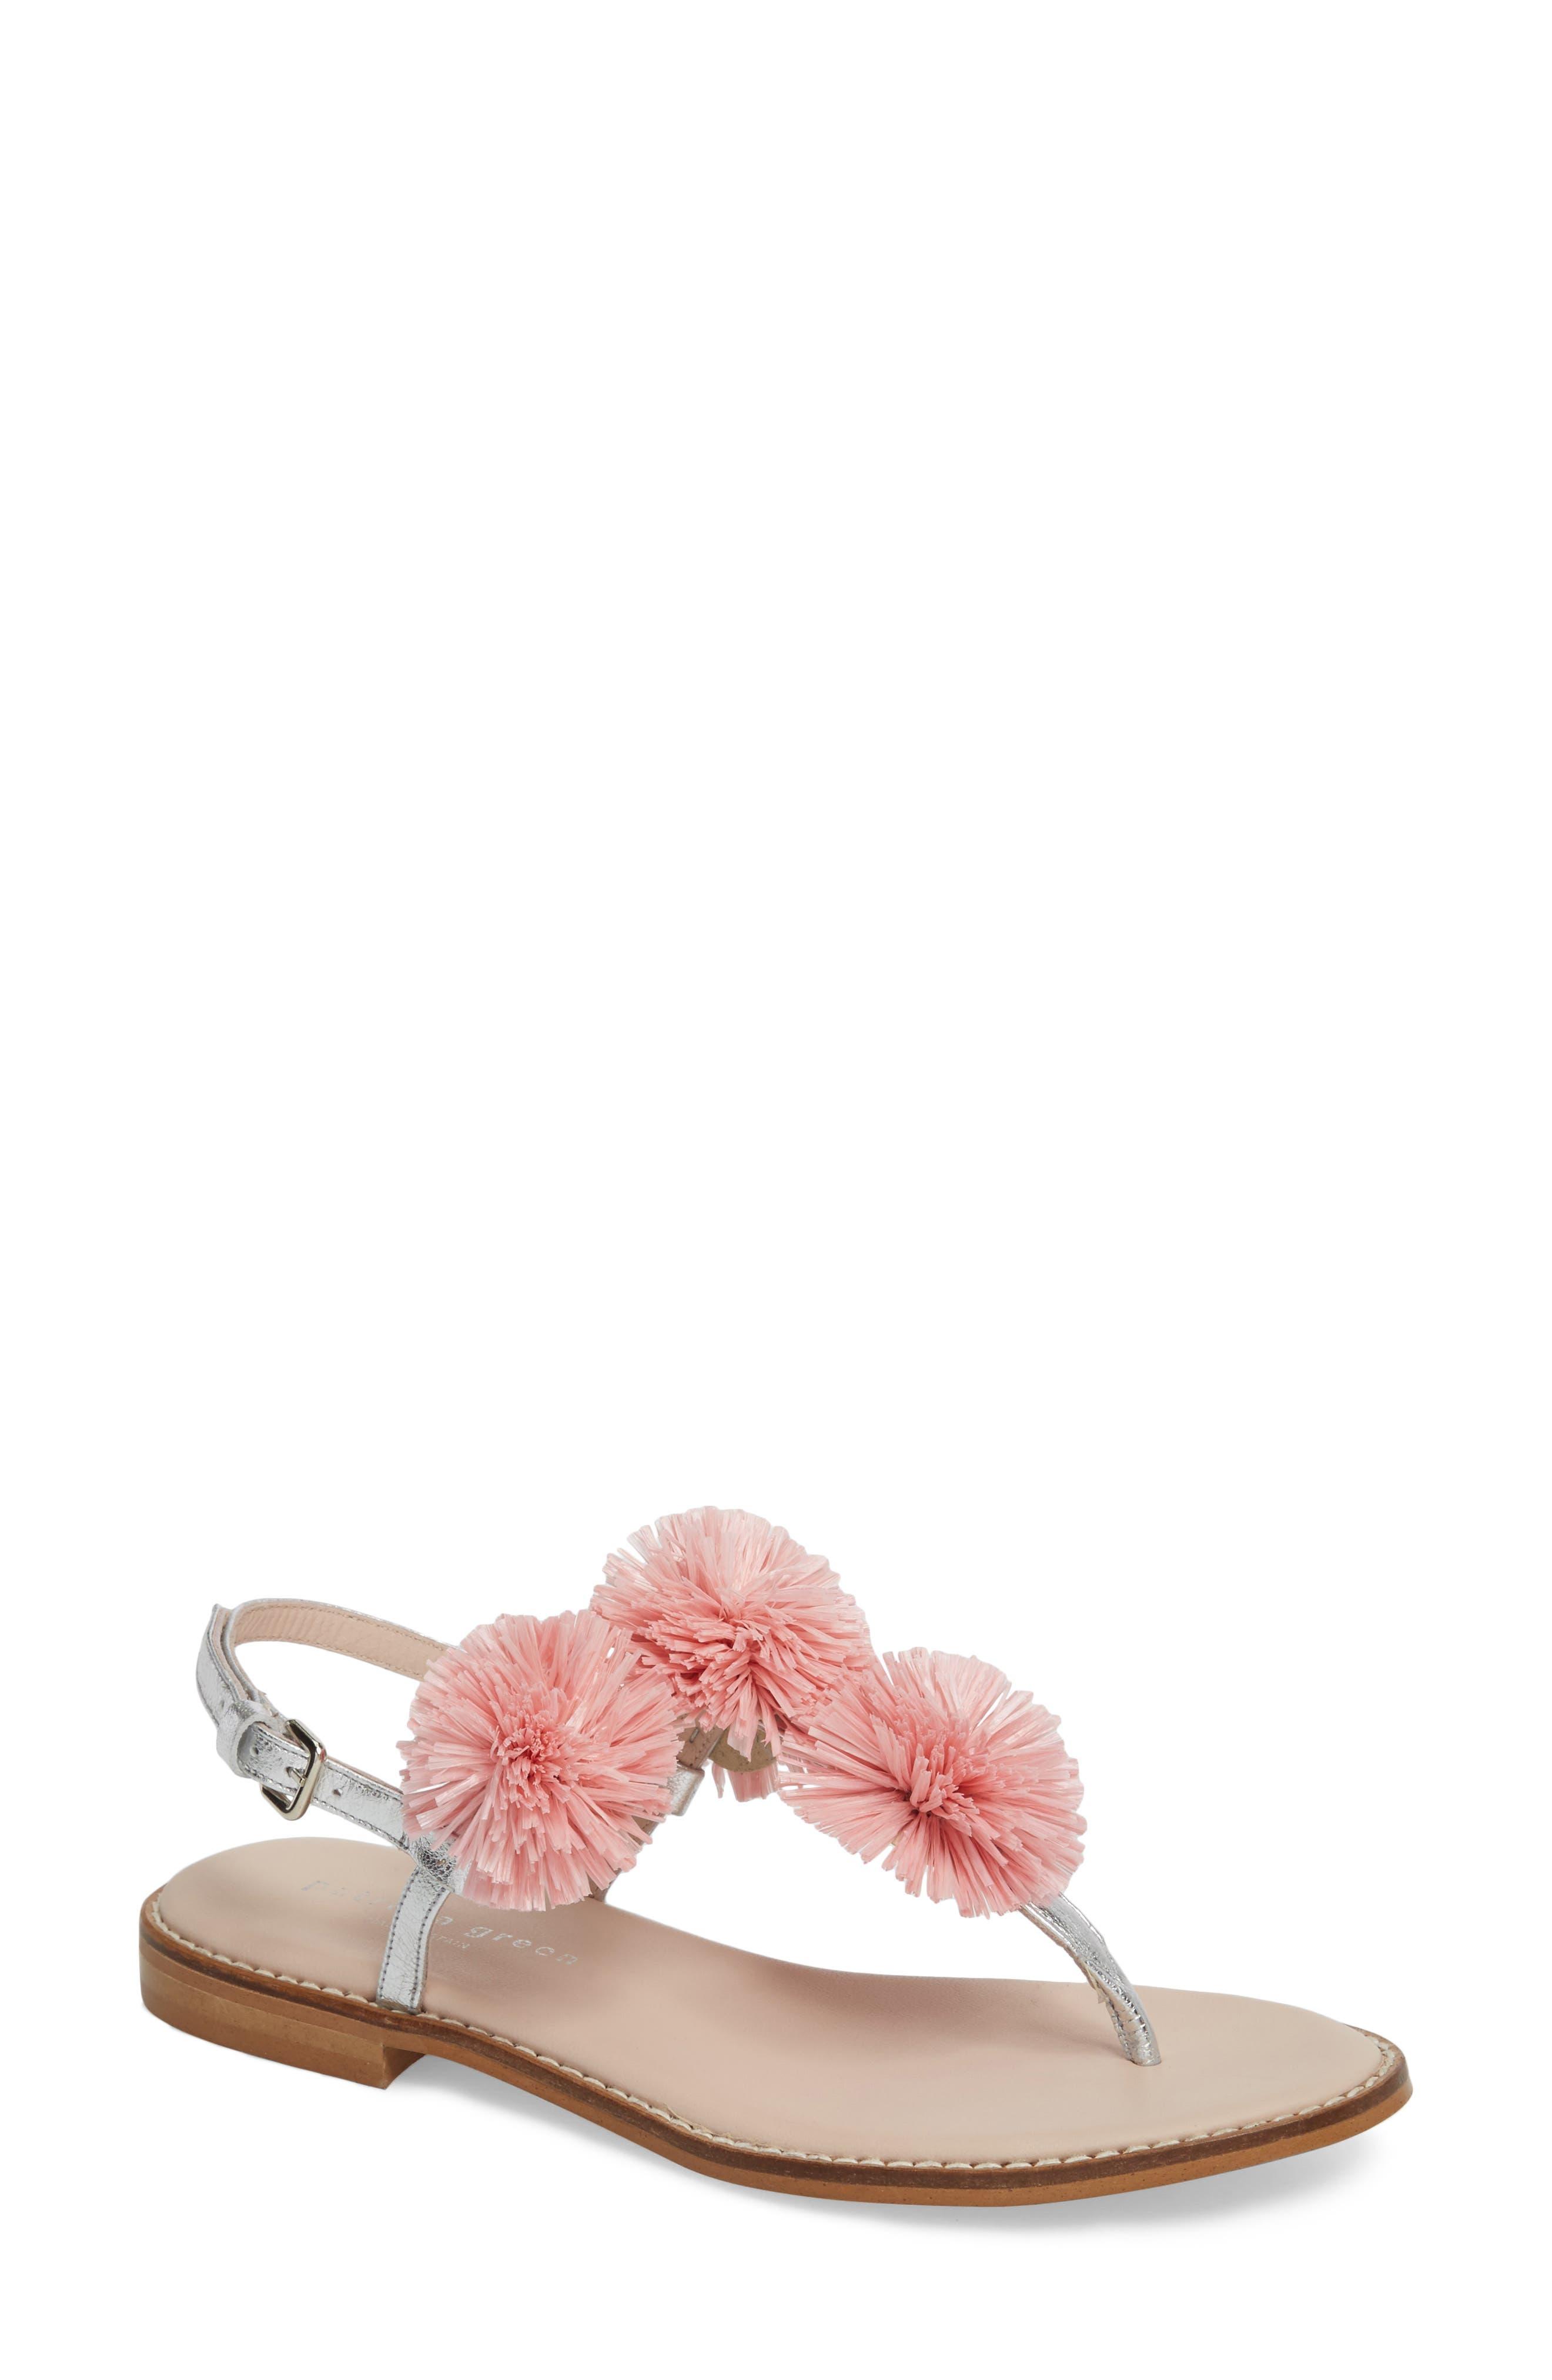 Pompom Thong Sandal,                         Main,                         color, Pink Leather